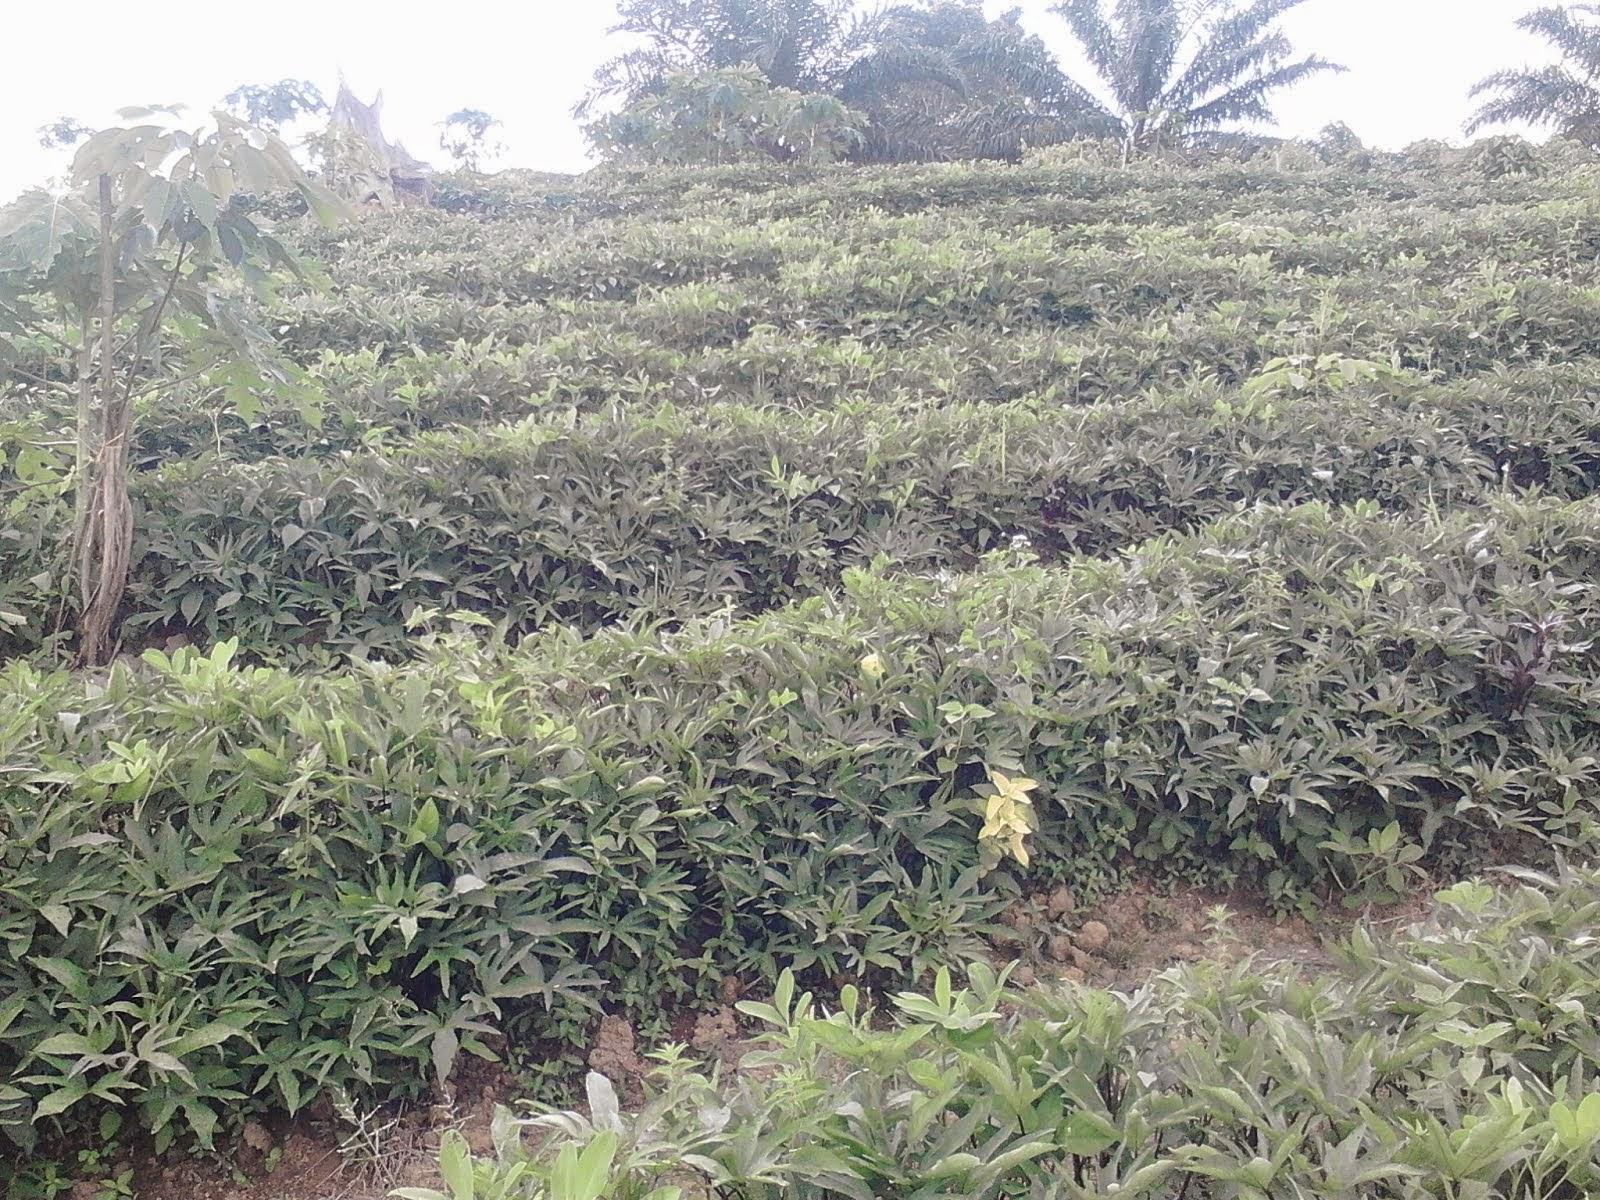 Tanaman ubi jalar Milik salah satu Petani di Desa Saing Prupuk